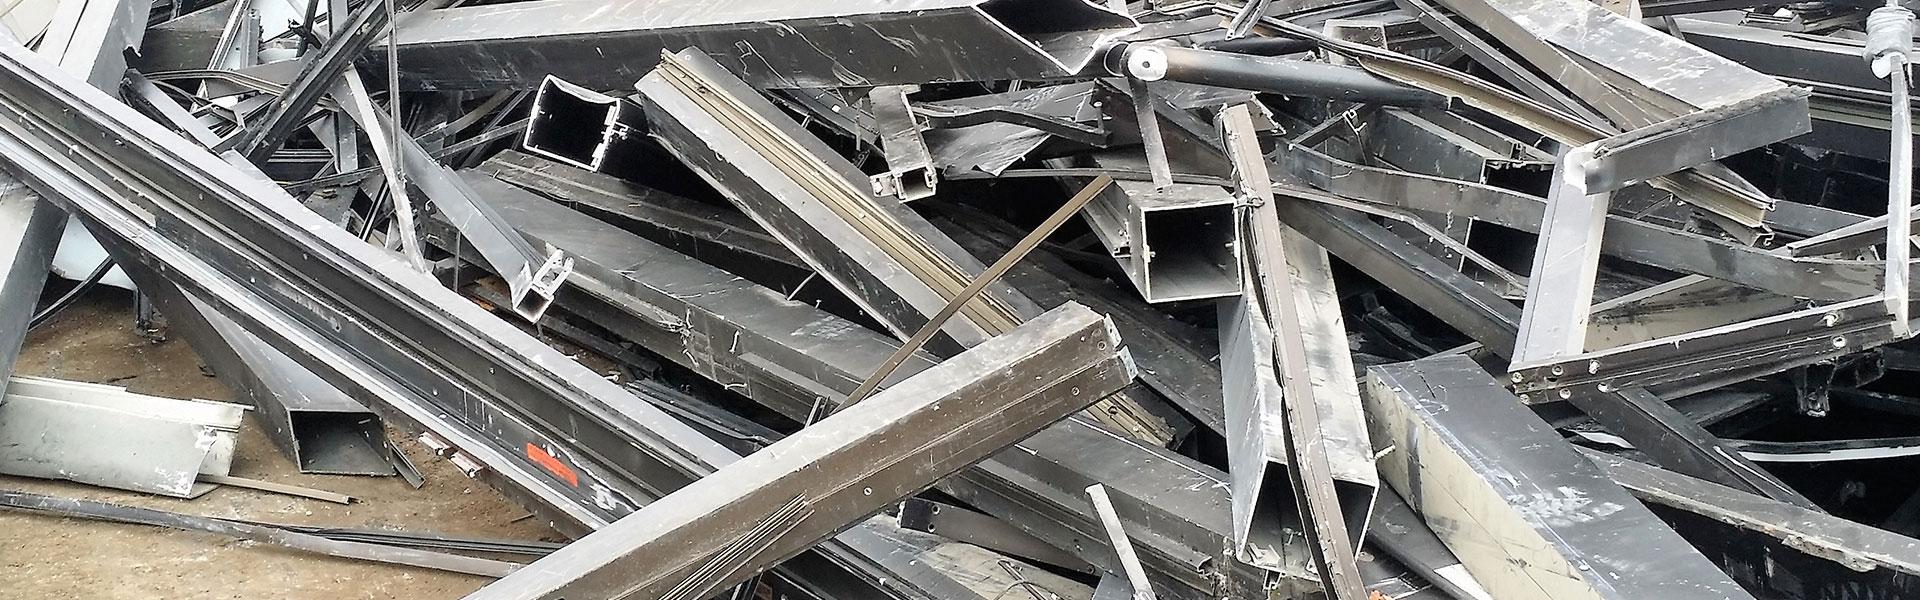 Modern Recycling Services - Norristown Dumpster Rental - Norristown Scrap Metal